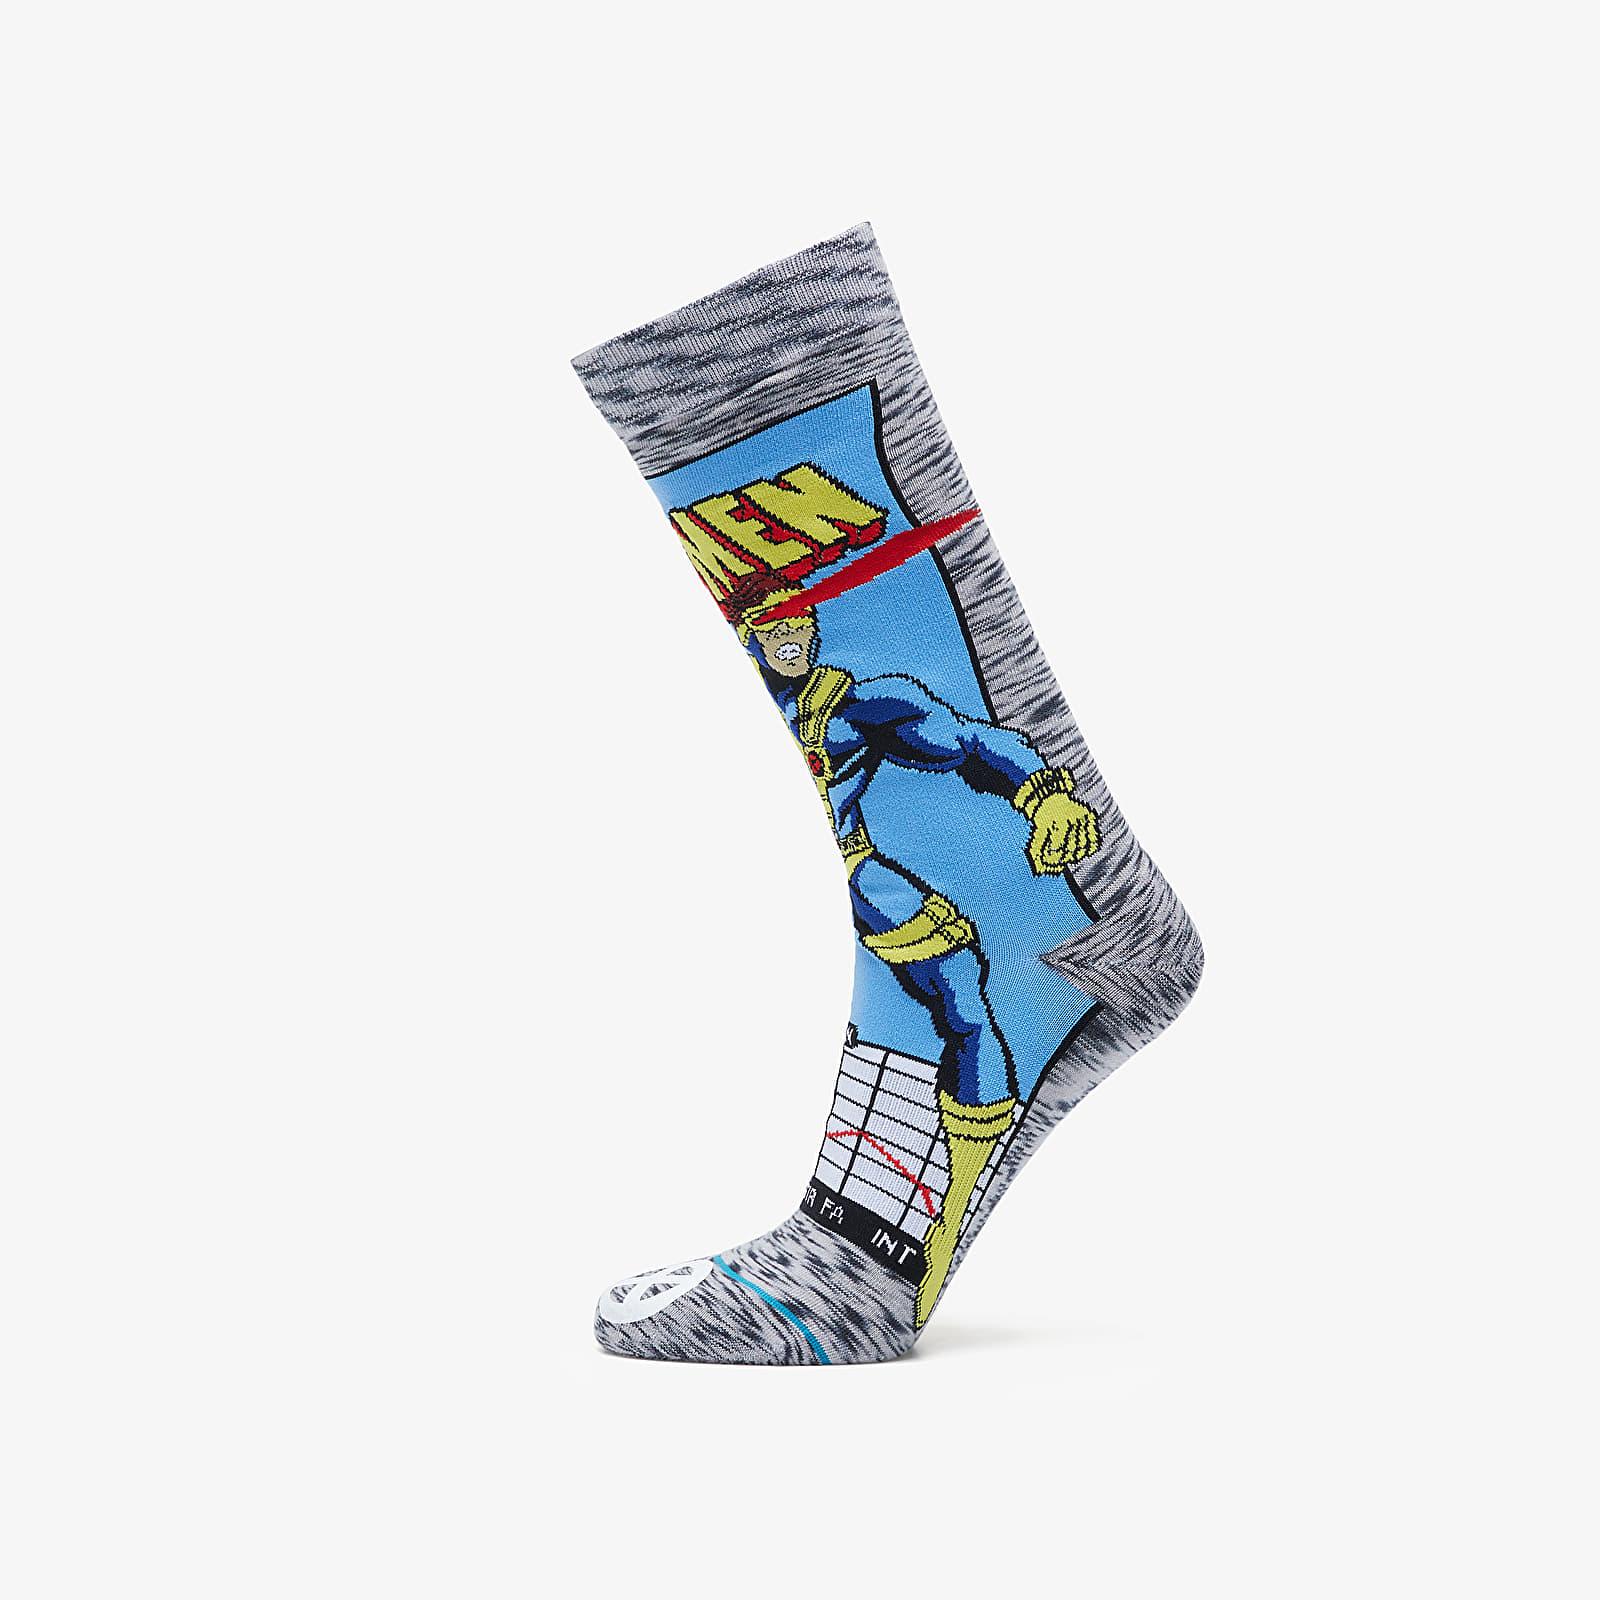 Socks Stance x X-Men Cyclops Comic Socks Grey